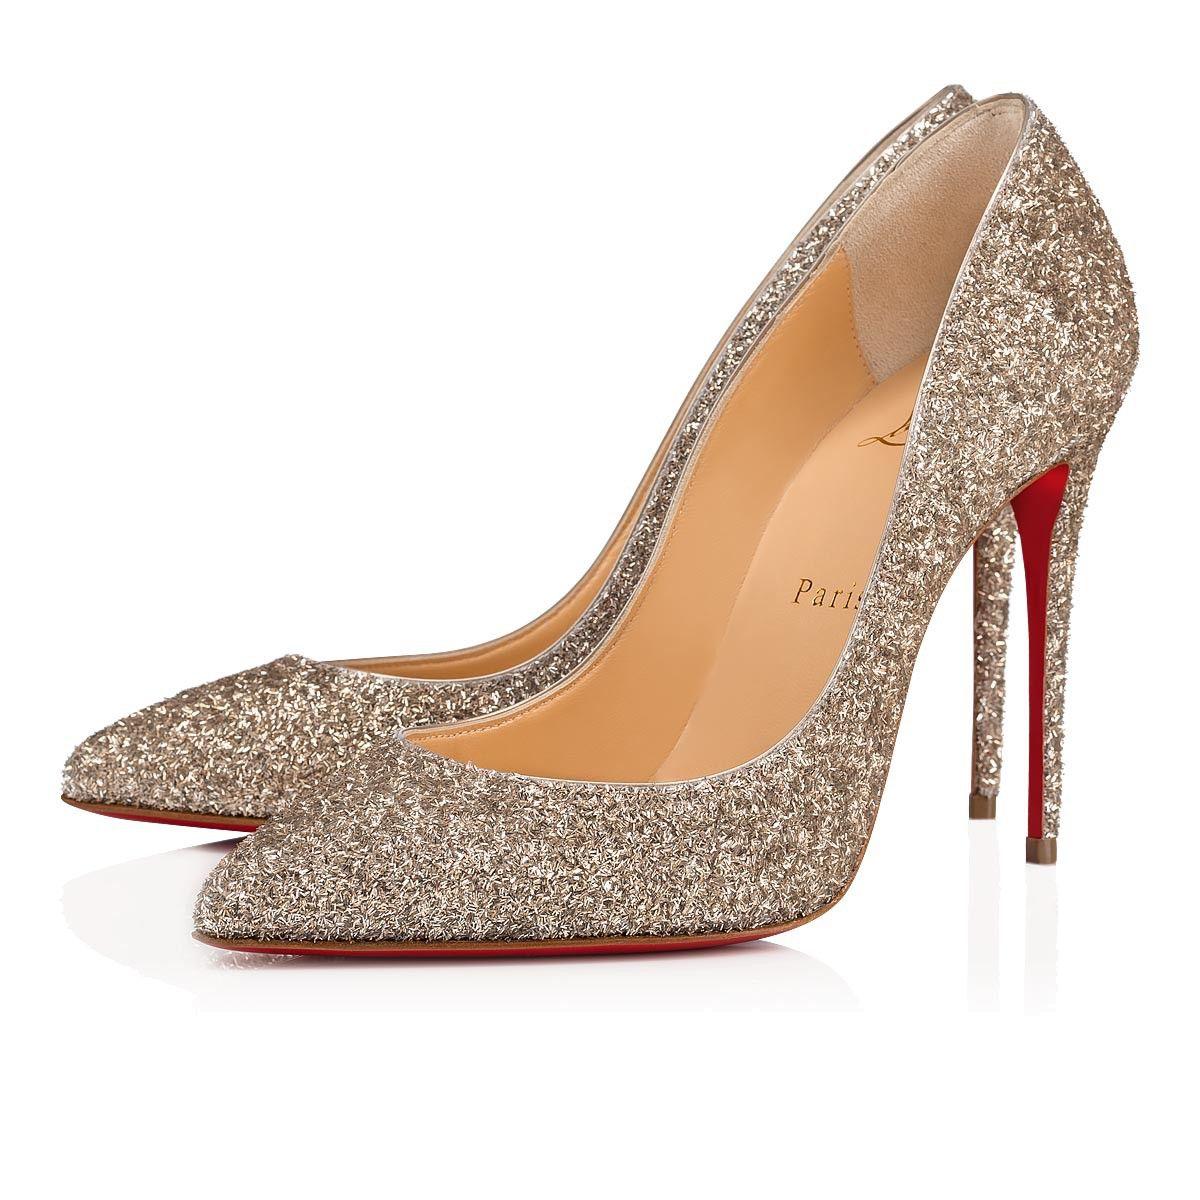 d9c650bf772 Pigalle Follies Glitter Givre 100 Perle Glitter - Women Shoes ...